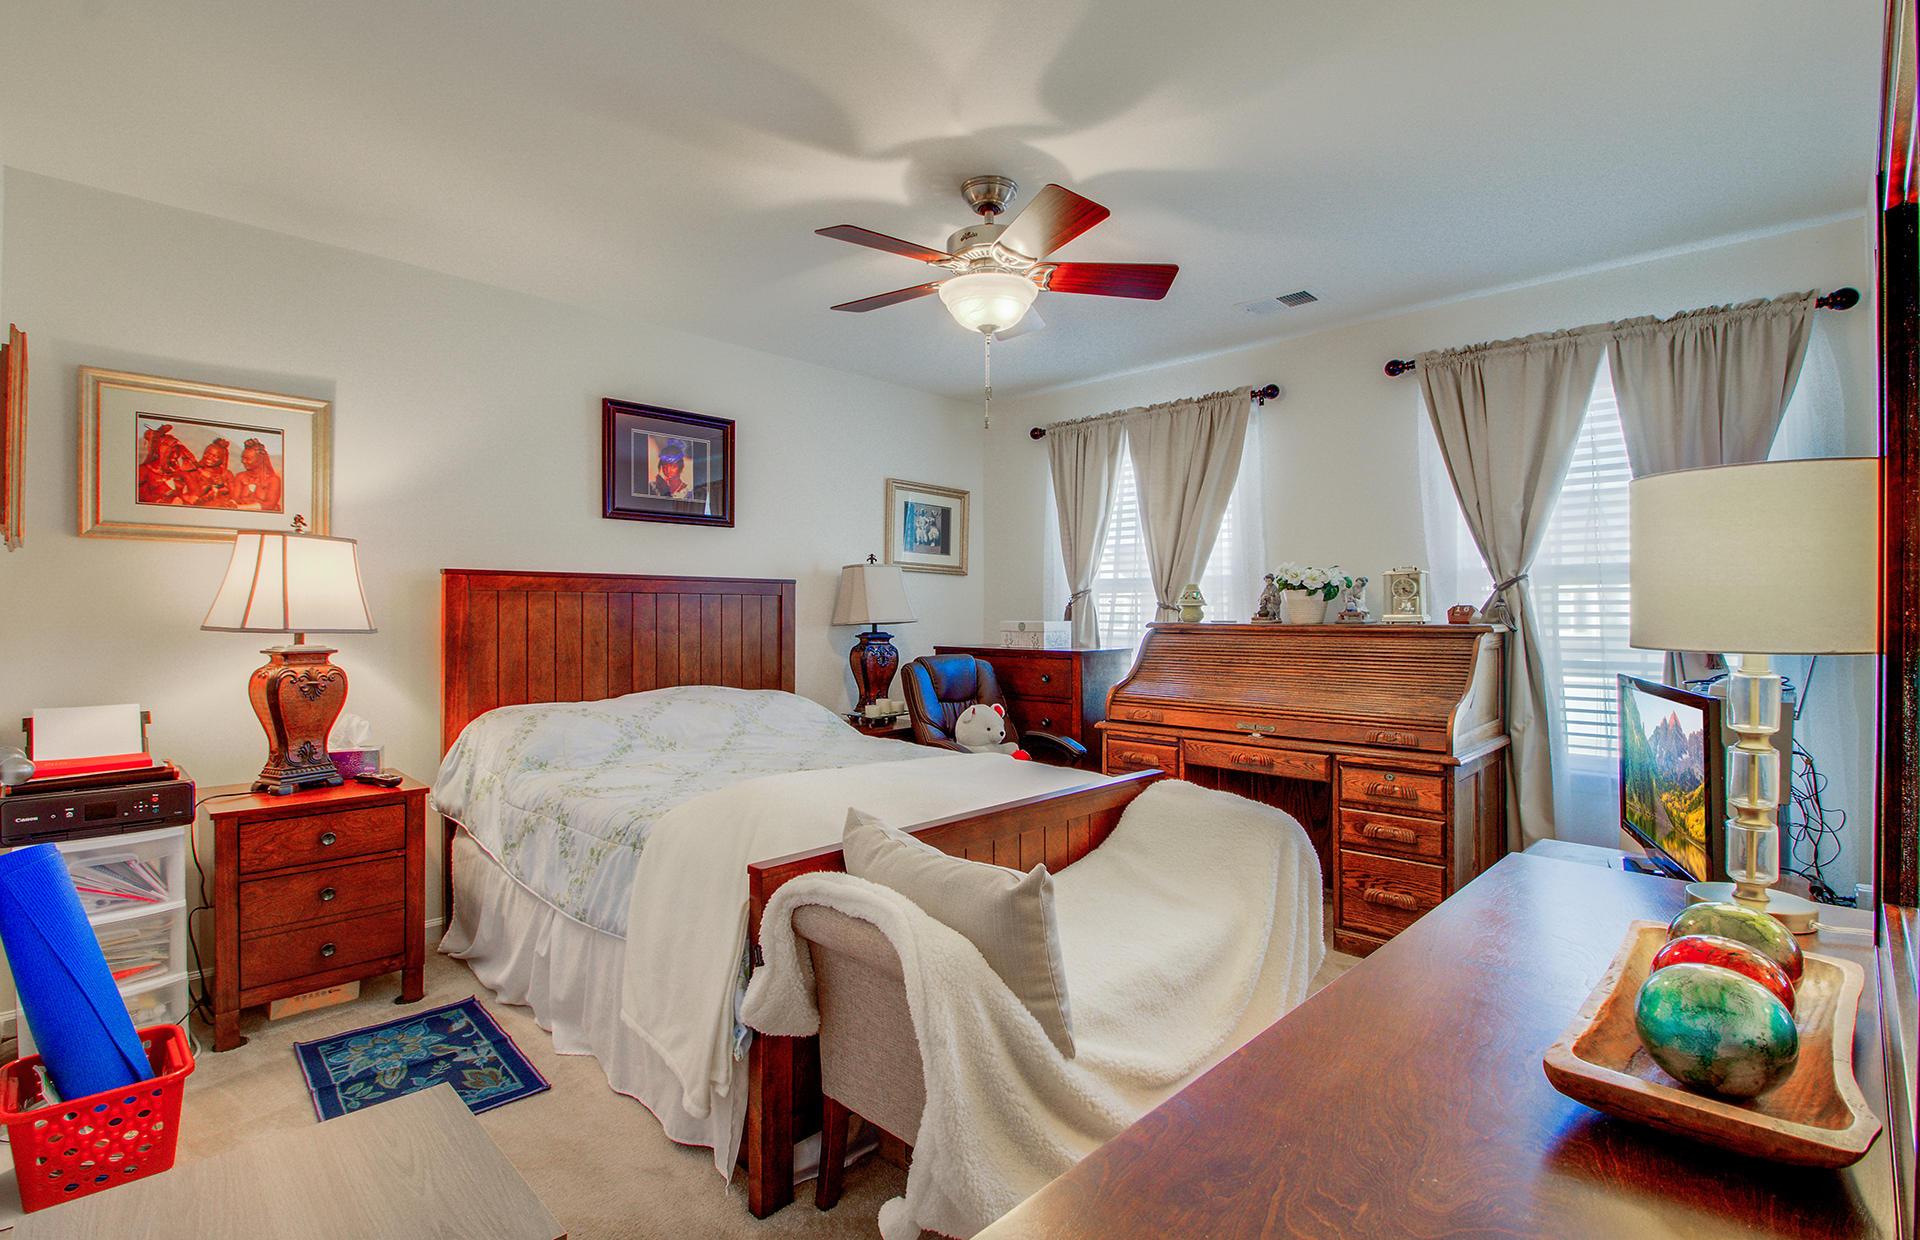 Cane Bay Plantation Homes For Sale - 255 Spectrum, Summerville, SC - 24